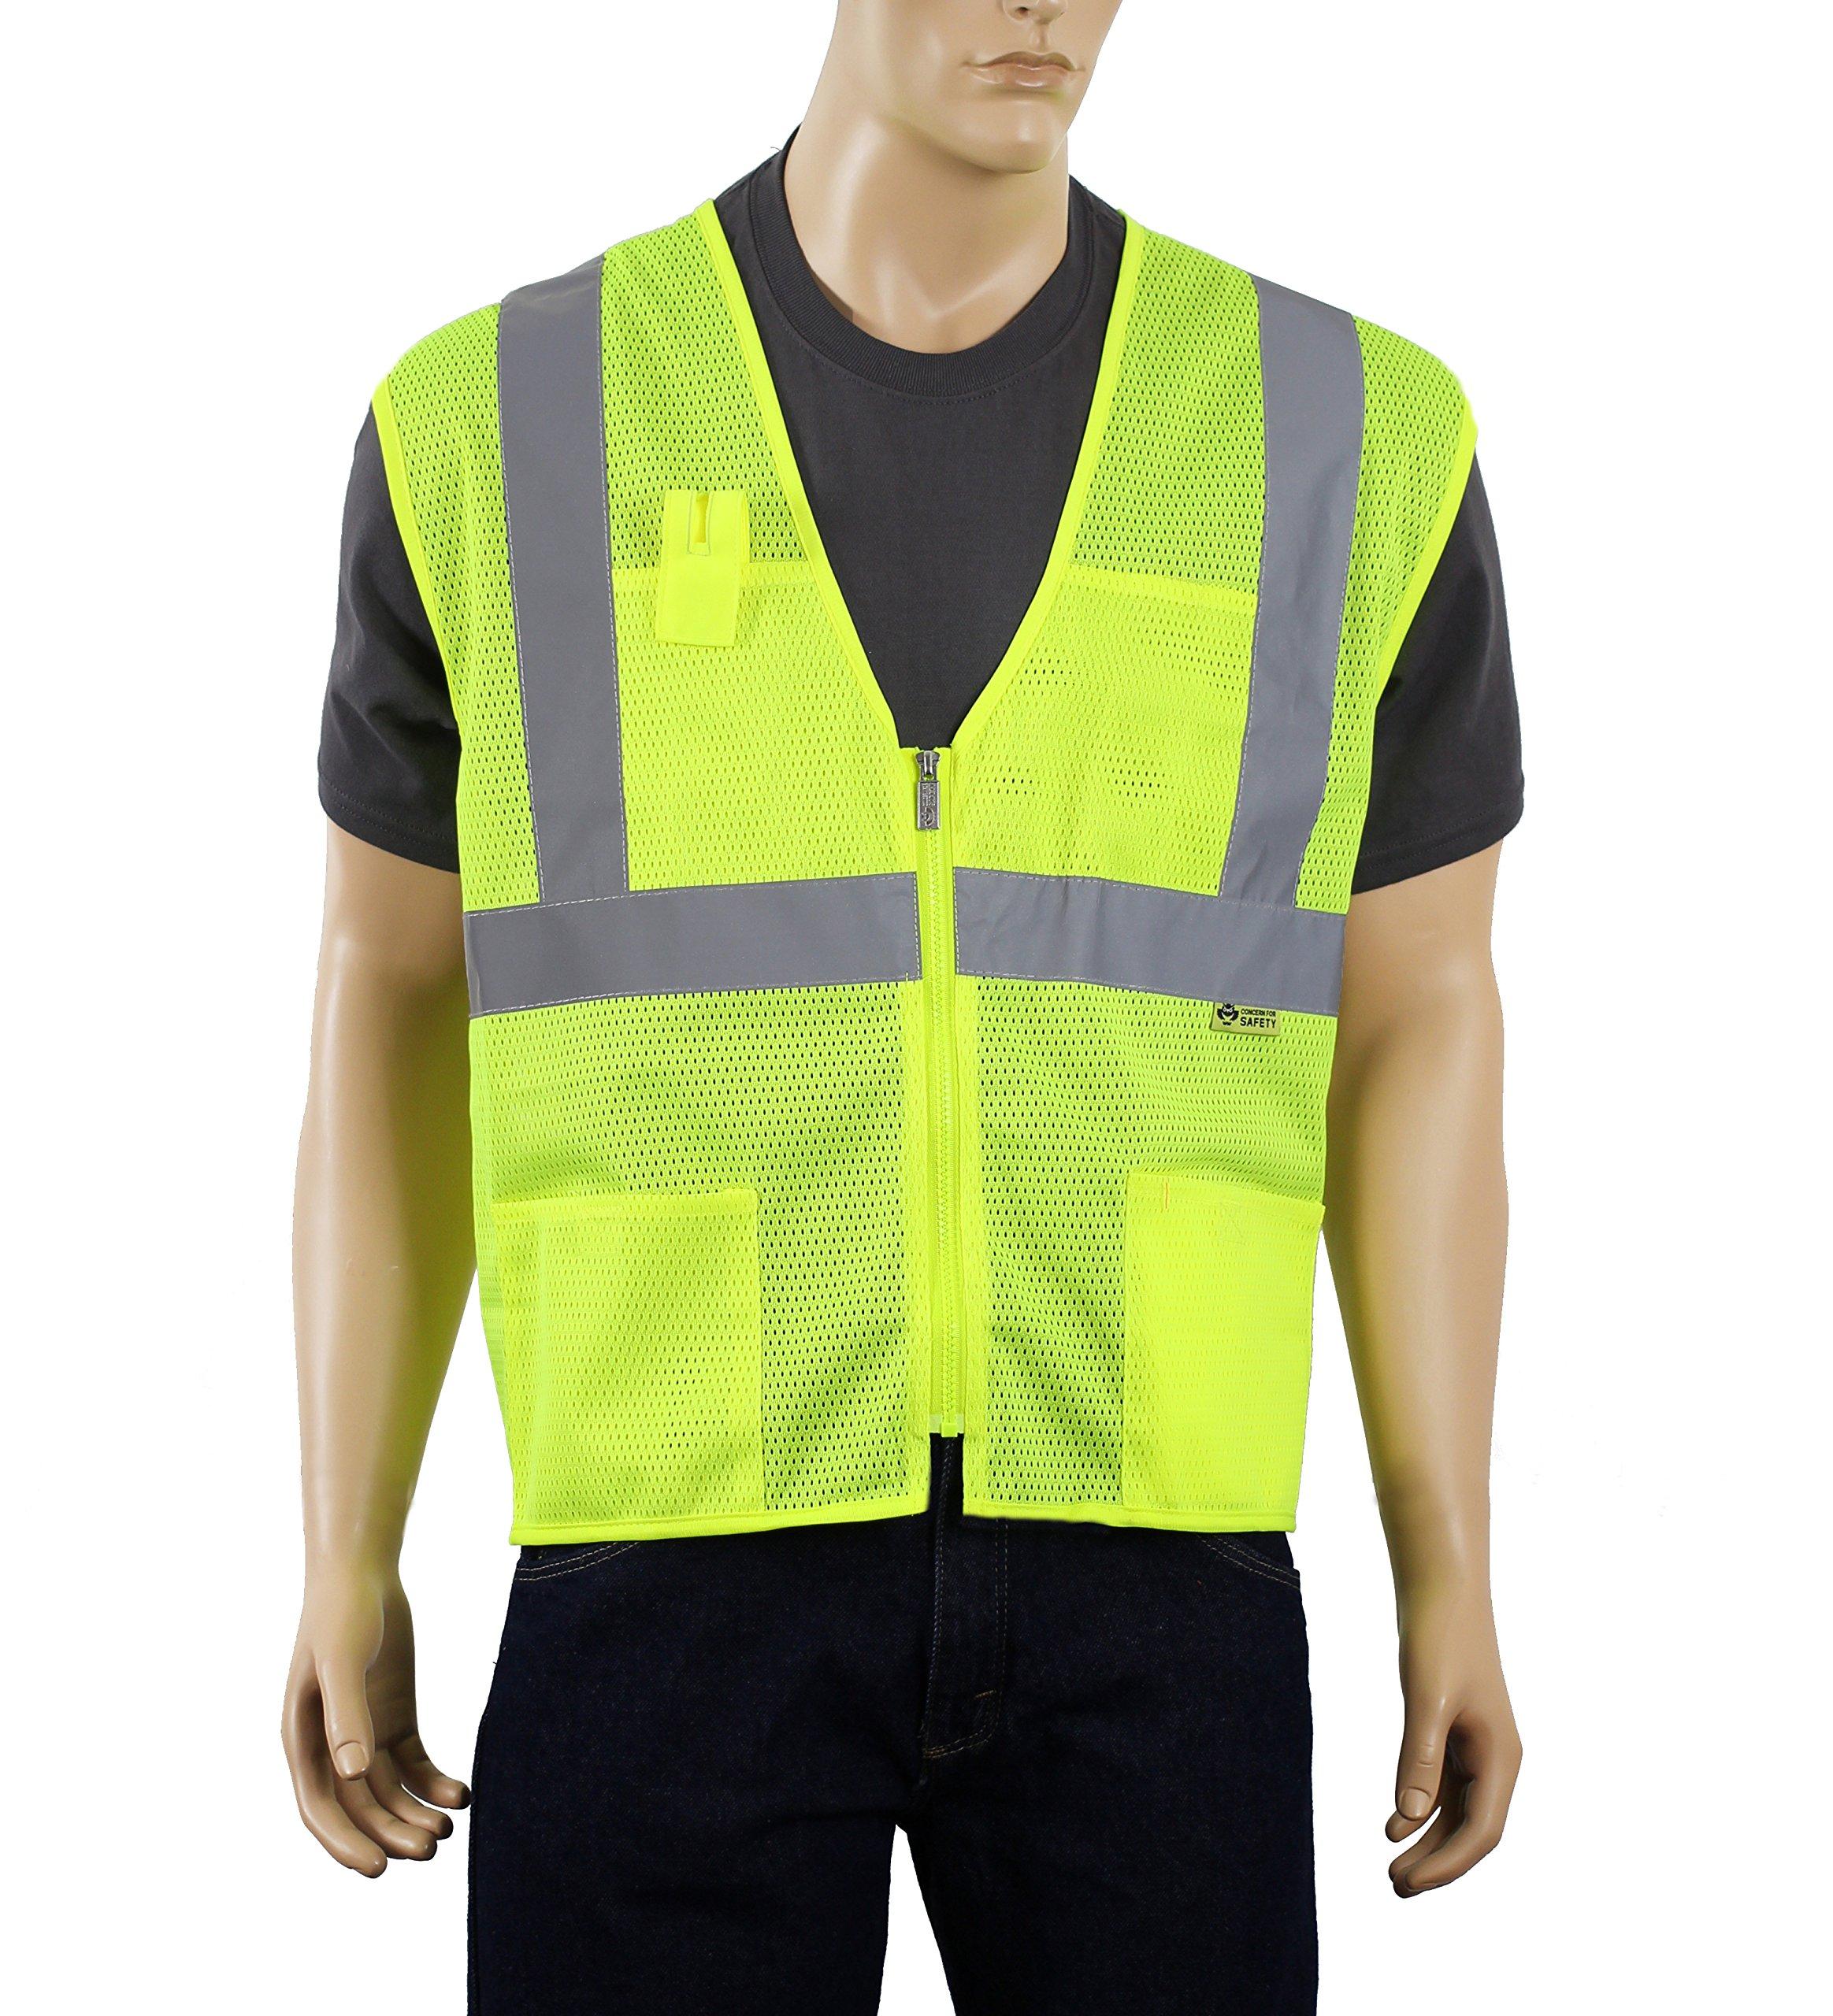 Safety Depot Class 2 Ansi Safety Vest Zipper with Pockets High Visibility Reflective Lime A520 (Medium)